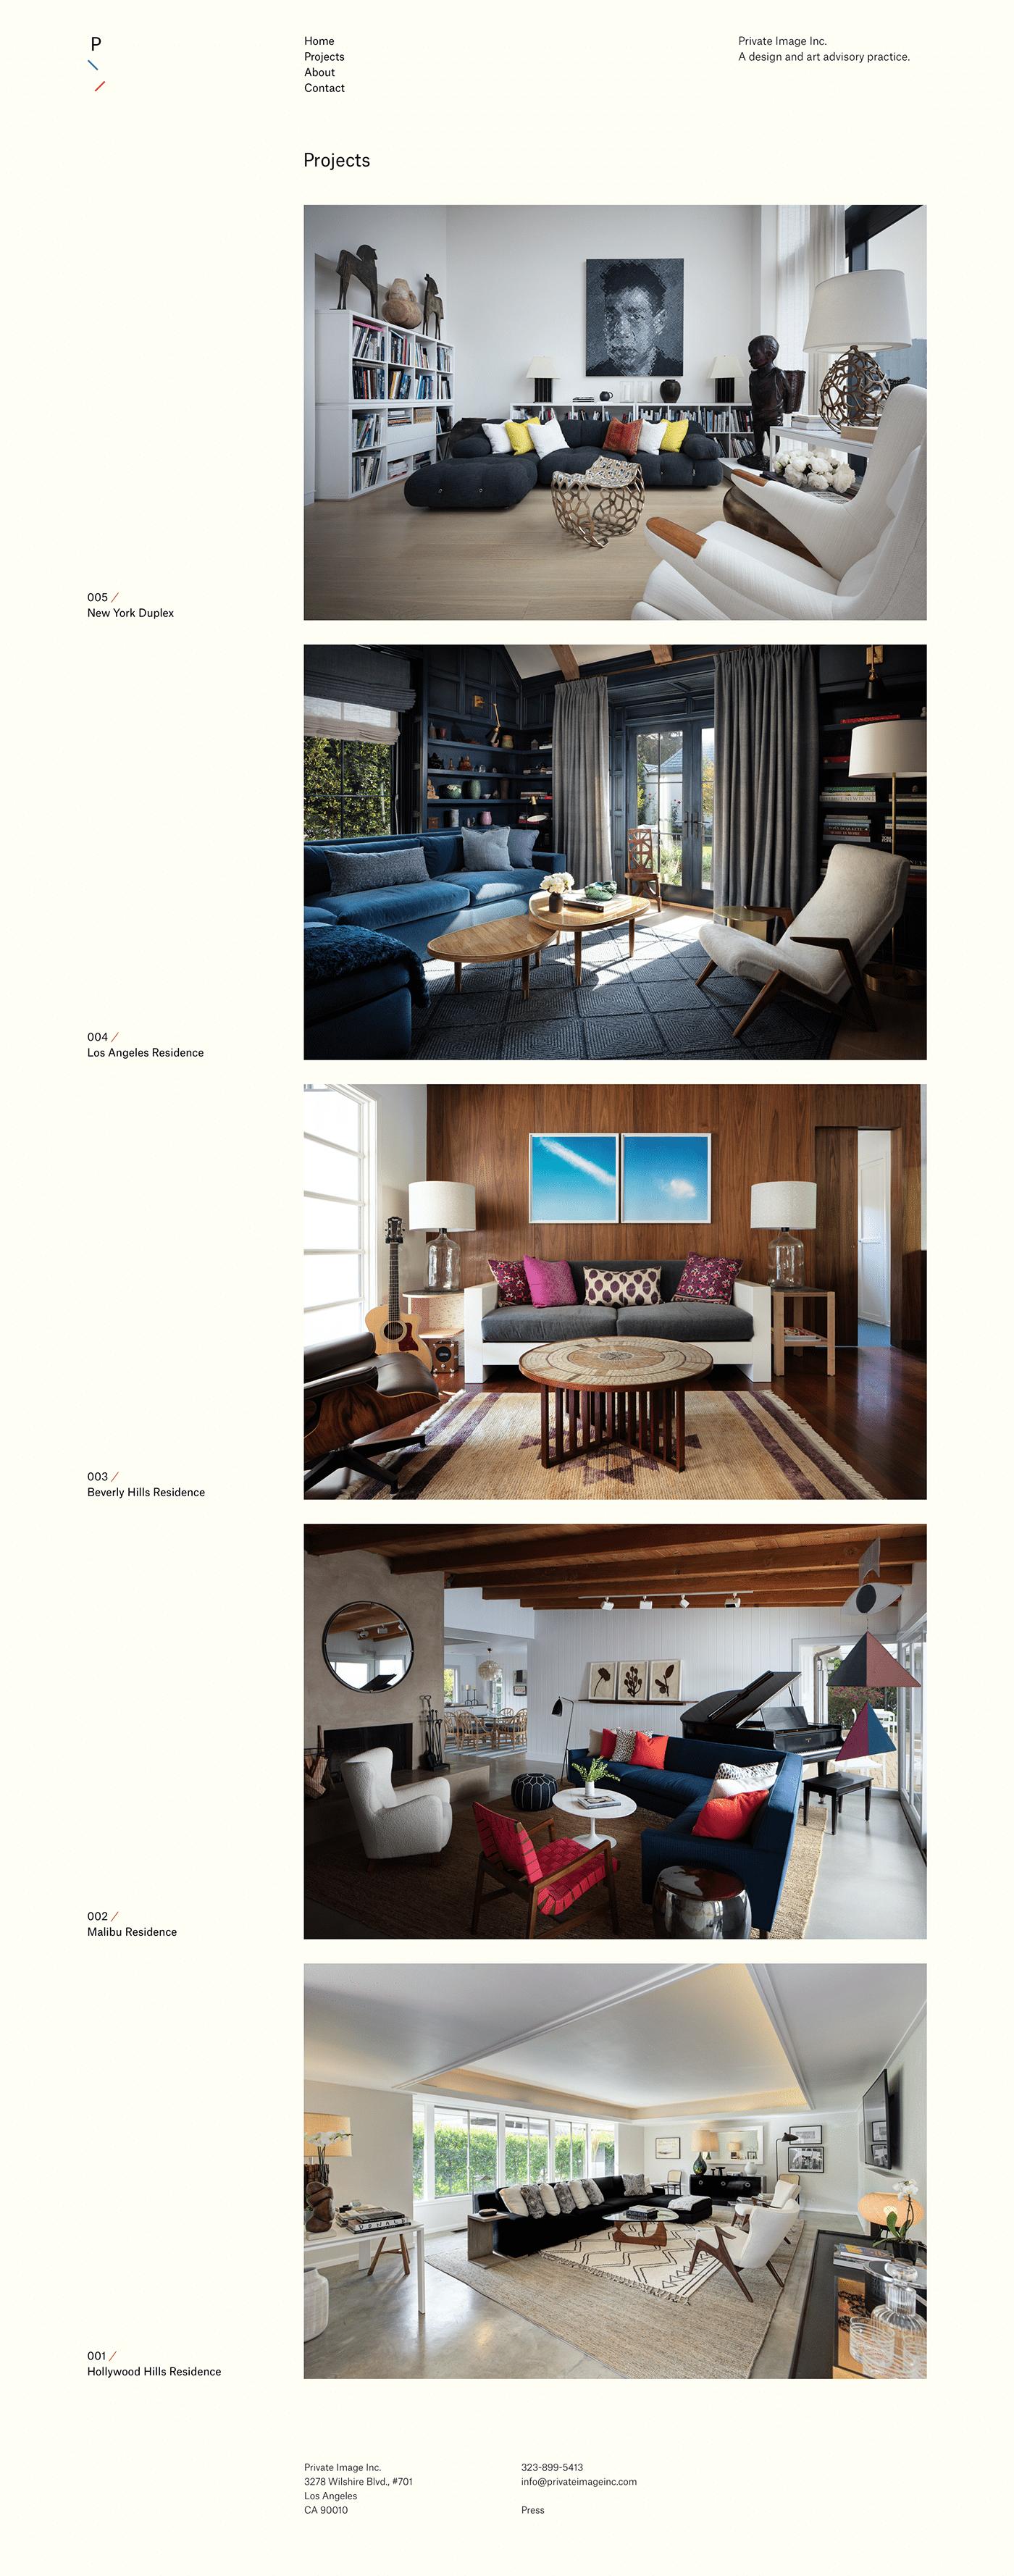 art design grid based interior design  Private Image Inc squarespace The Printer's Son Web Design  web development